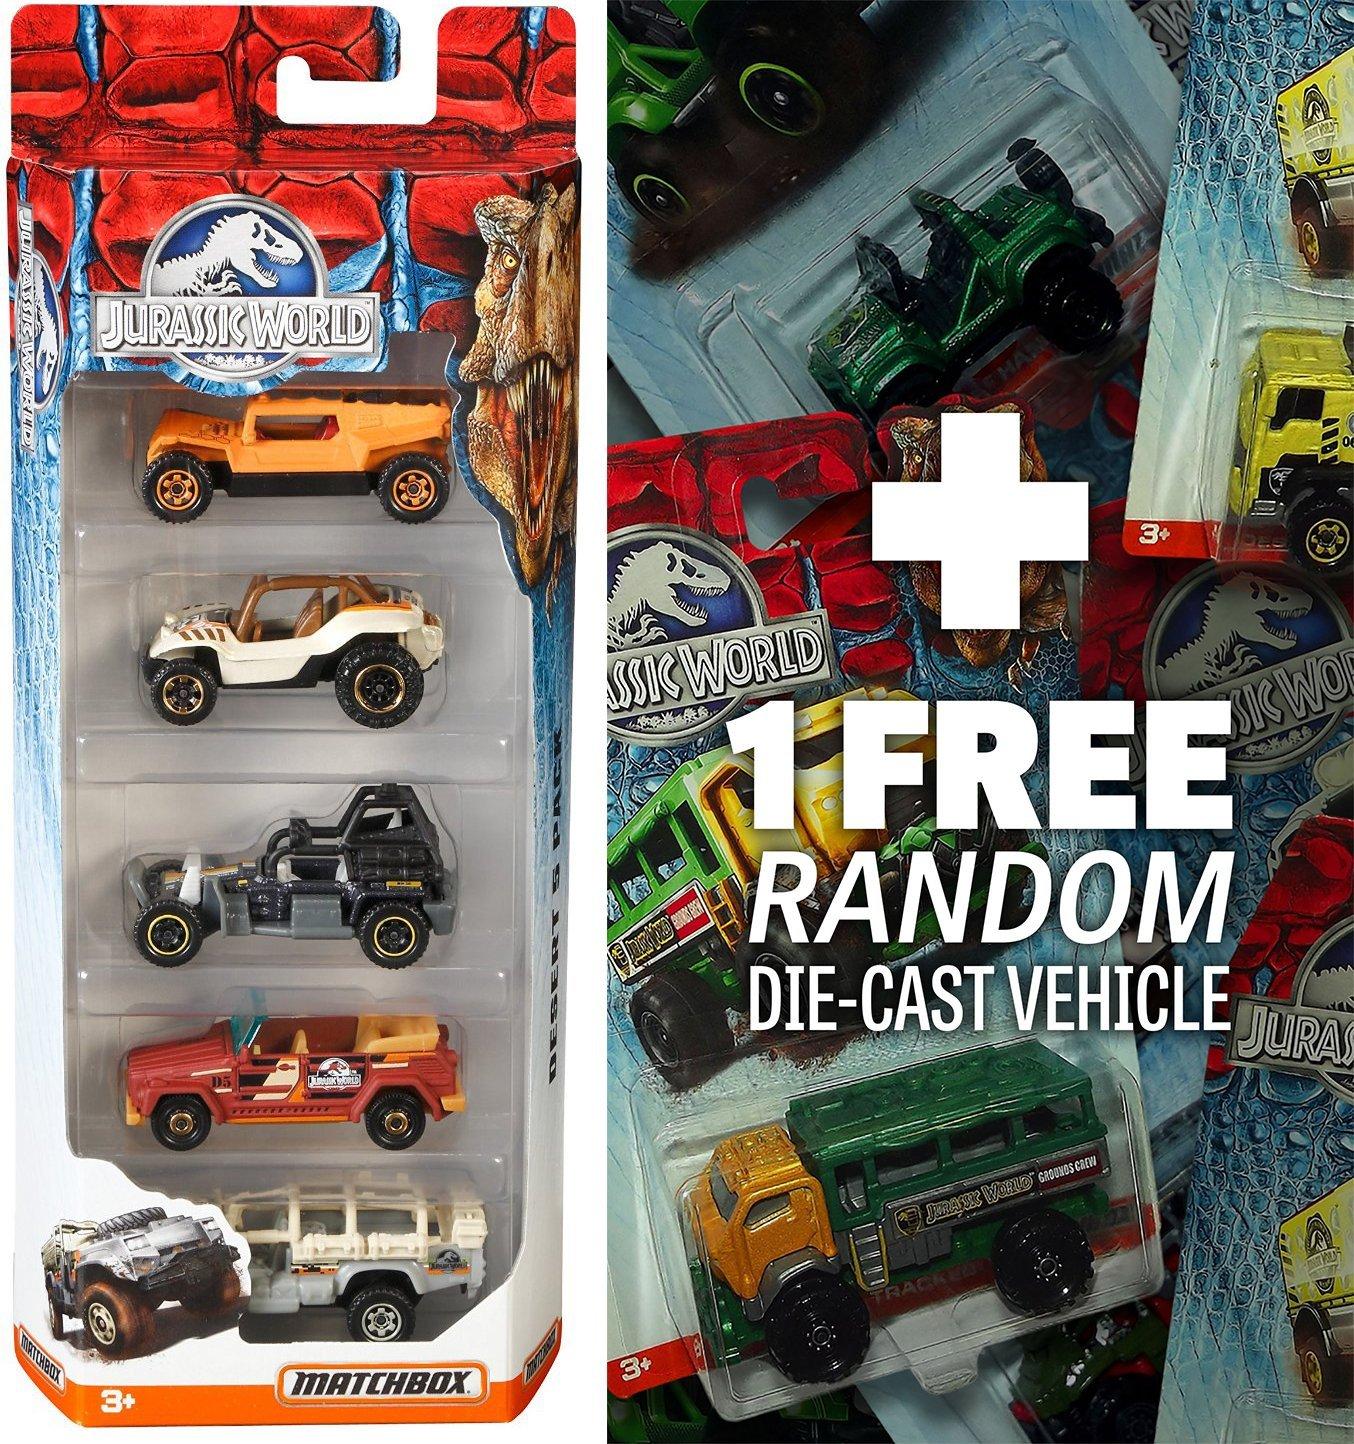 Jurassic World Land 5-Vehicle Pack (NOT RANDOMLY PICKED) + 1 FREE Official Jurassic World Matchbox Die-cast Vehicle Bundle [Set# CJM07]